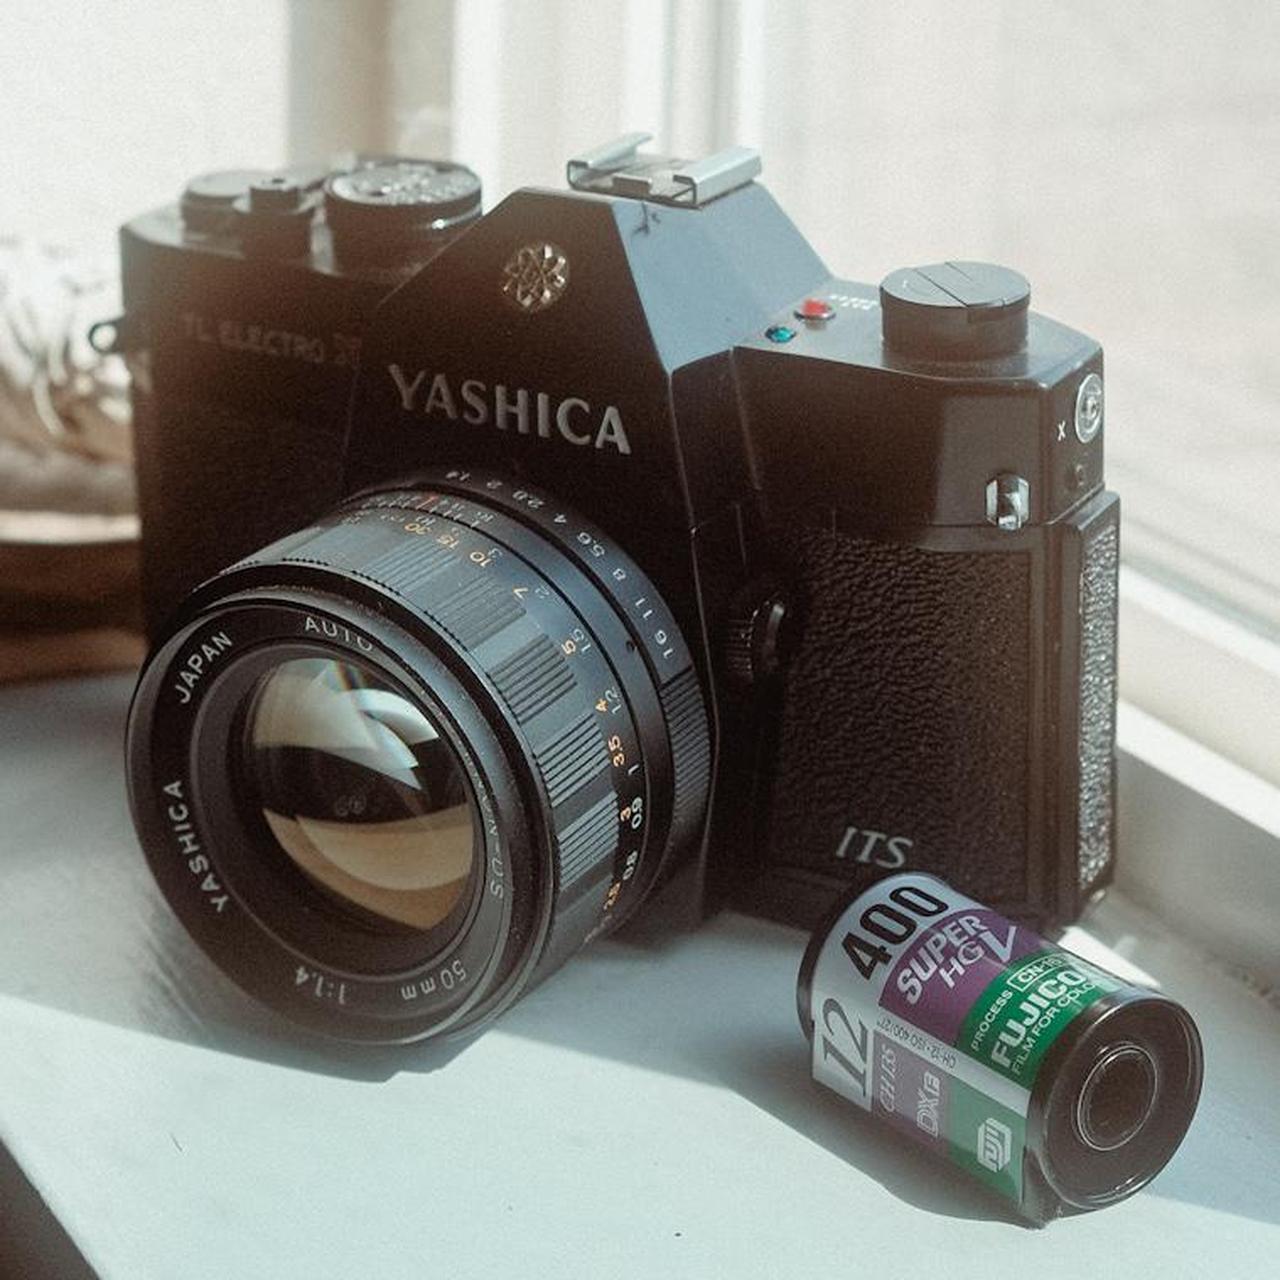 Product Image 1 - Yashica TL Electro X 35mm